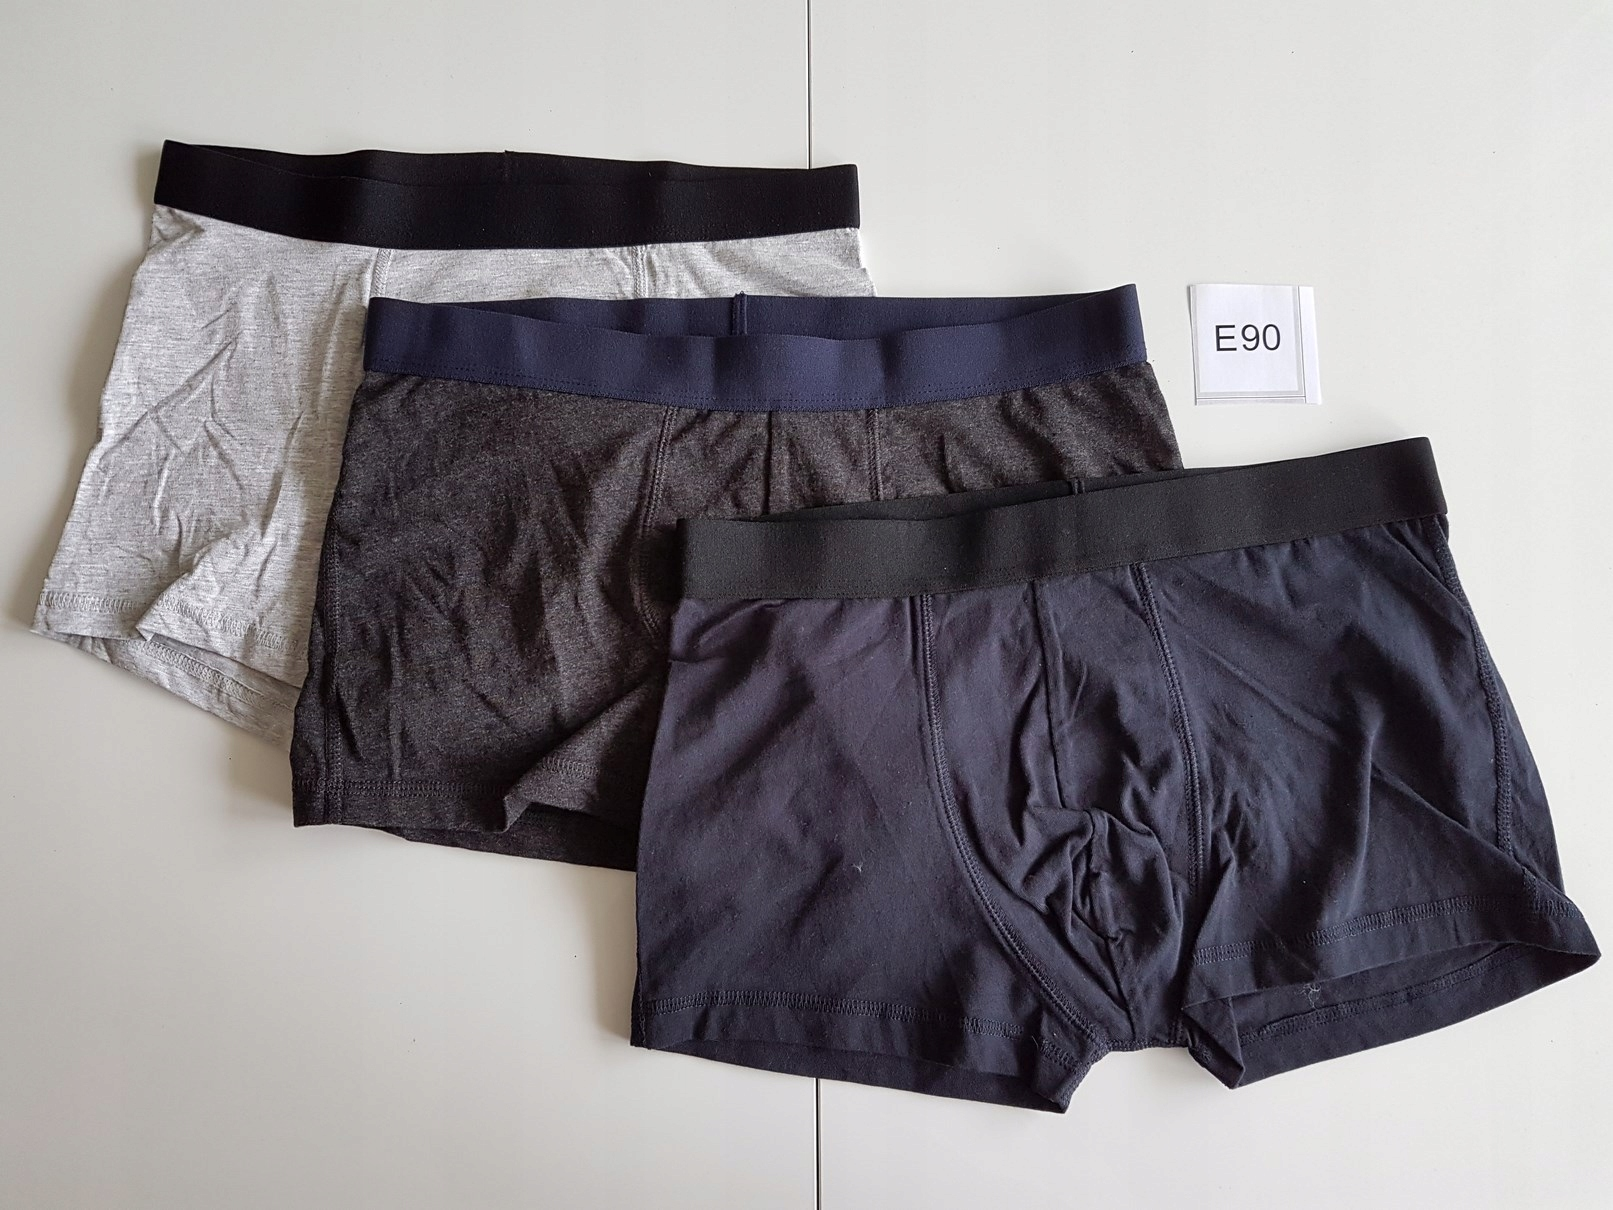 BOKSERKI majtki H&M rozm: M 3-pak E90